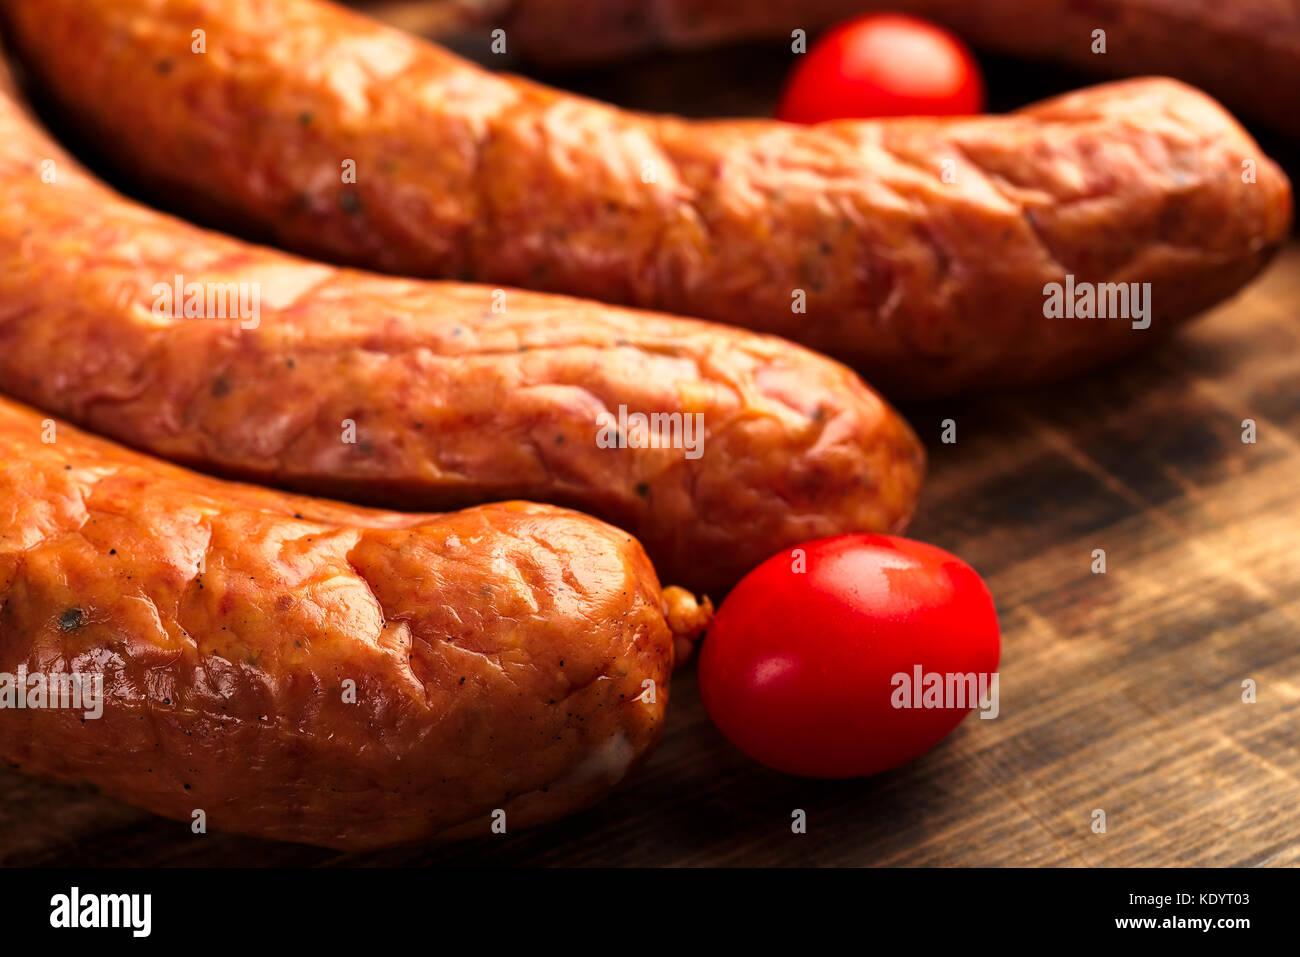 how to cook swedish sausage